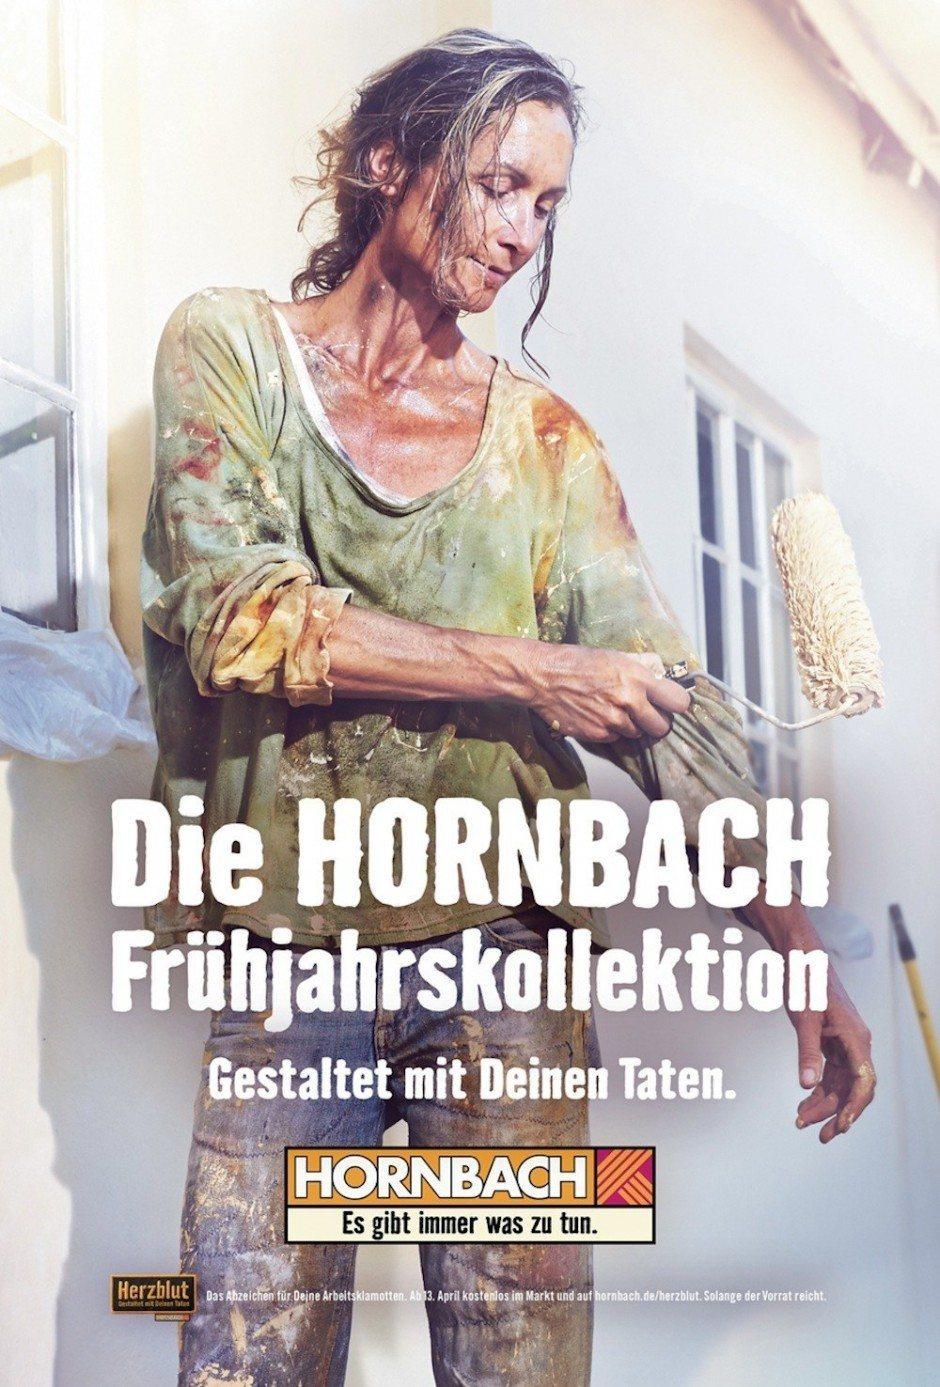 Silber Integrierte Kampagne: Hornbach Frühjahrskollektion von Heimat